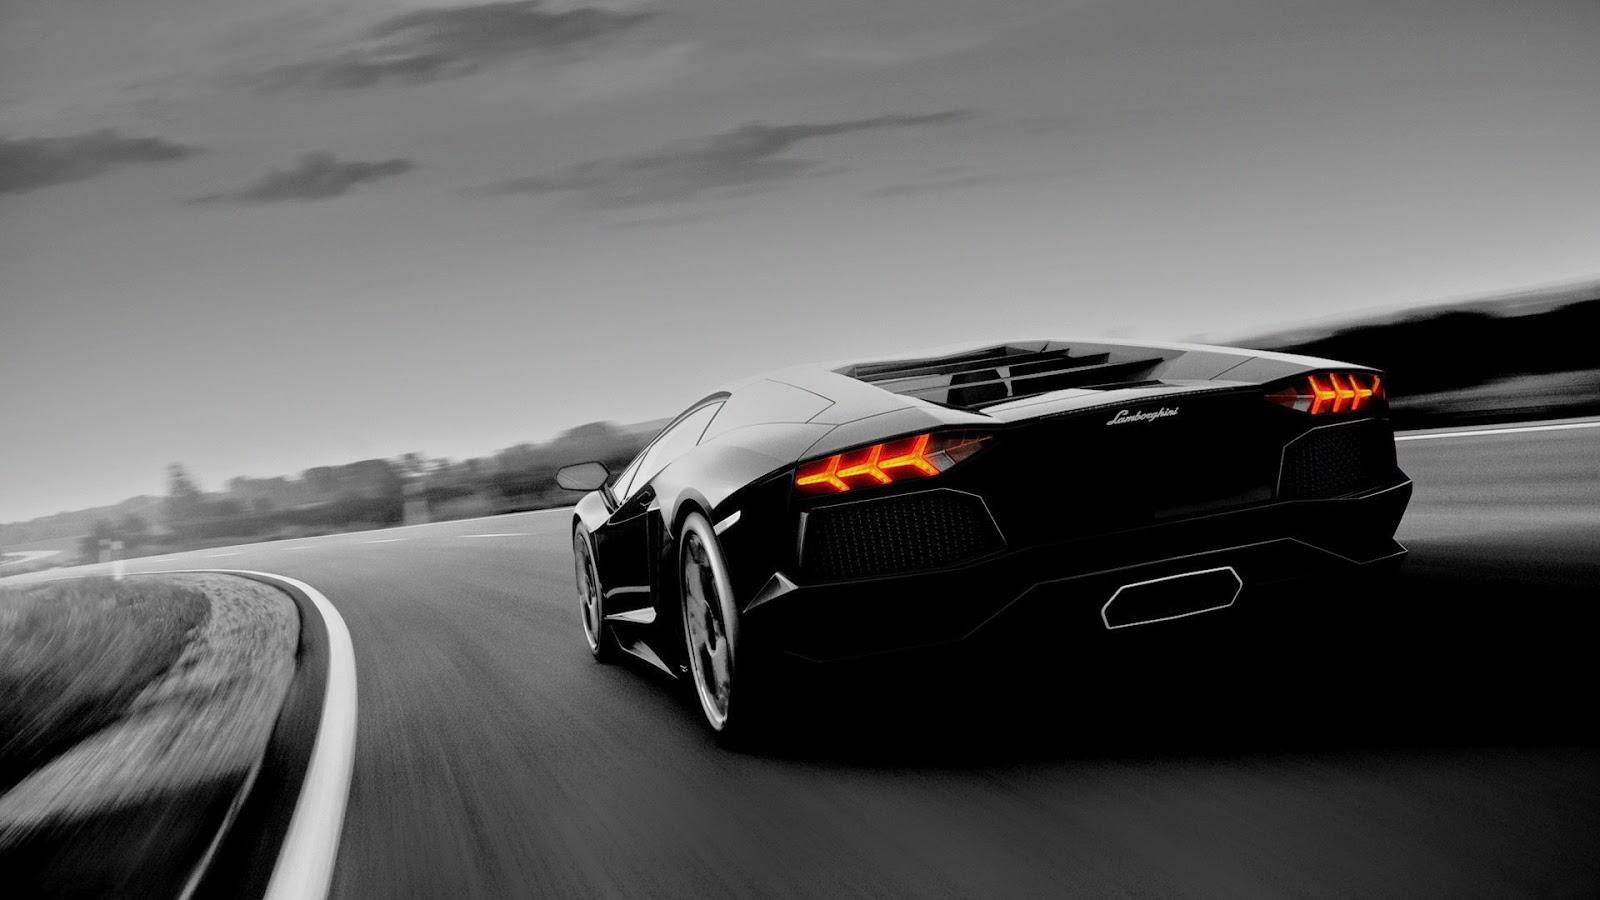 Lamborghini Aventador Theme For Windows 7 8 And 10 Win2themes